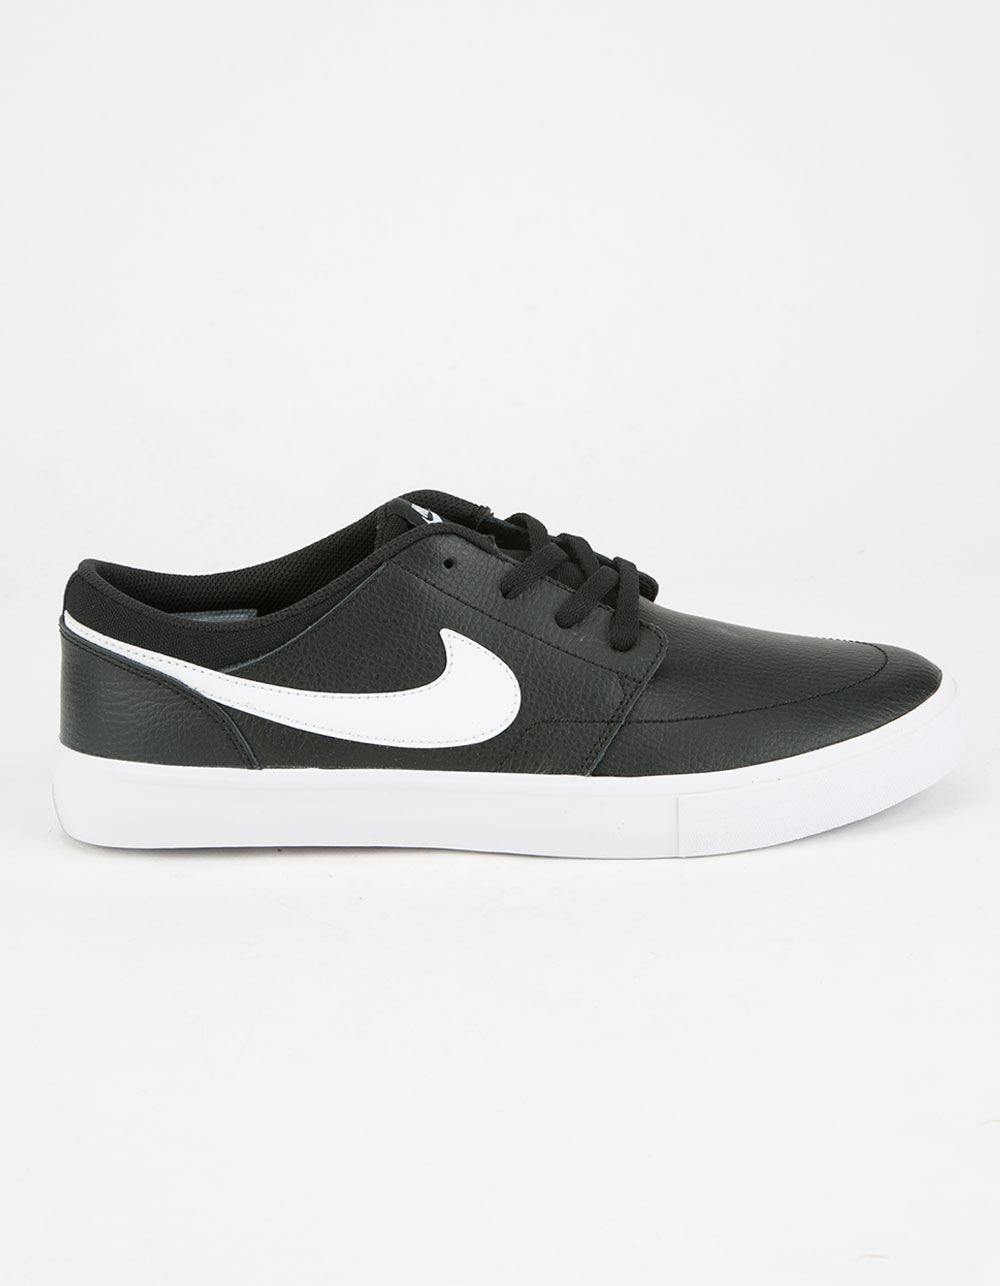 6e194942d6 Nike Sb Portmore Ii Solar Premium Shoes in Black for Men - Lyst